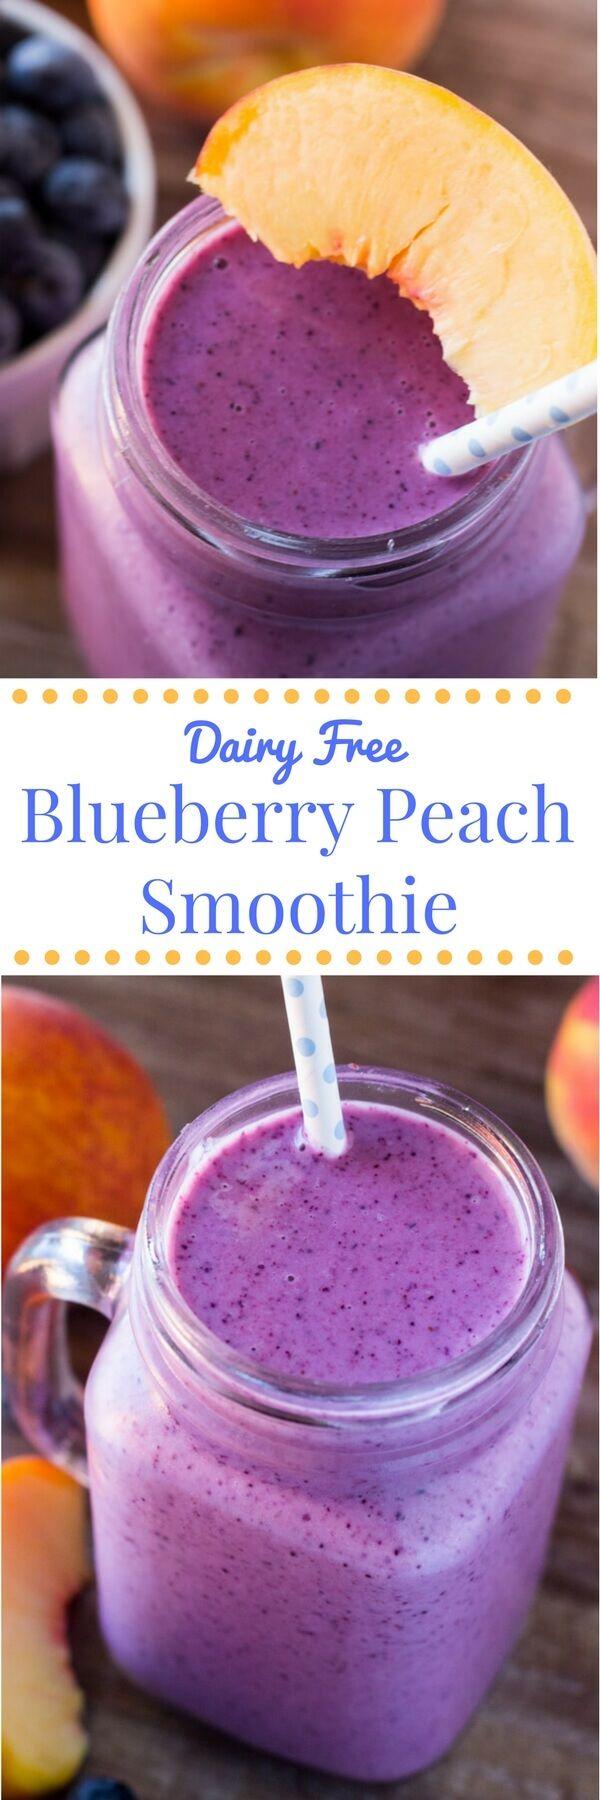 blueberry peach smoothie with almond milk